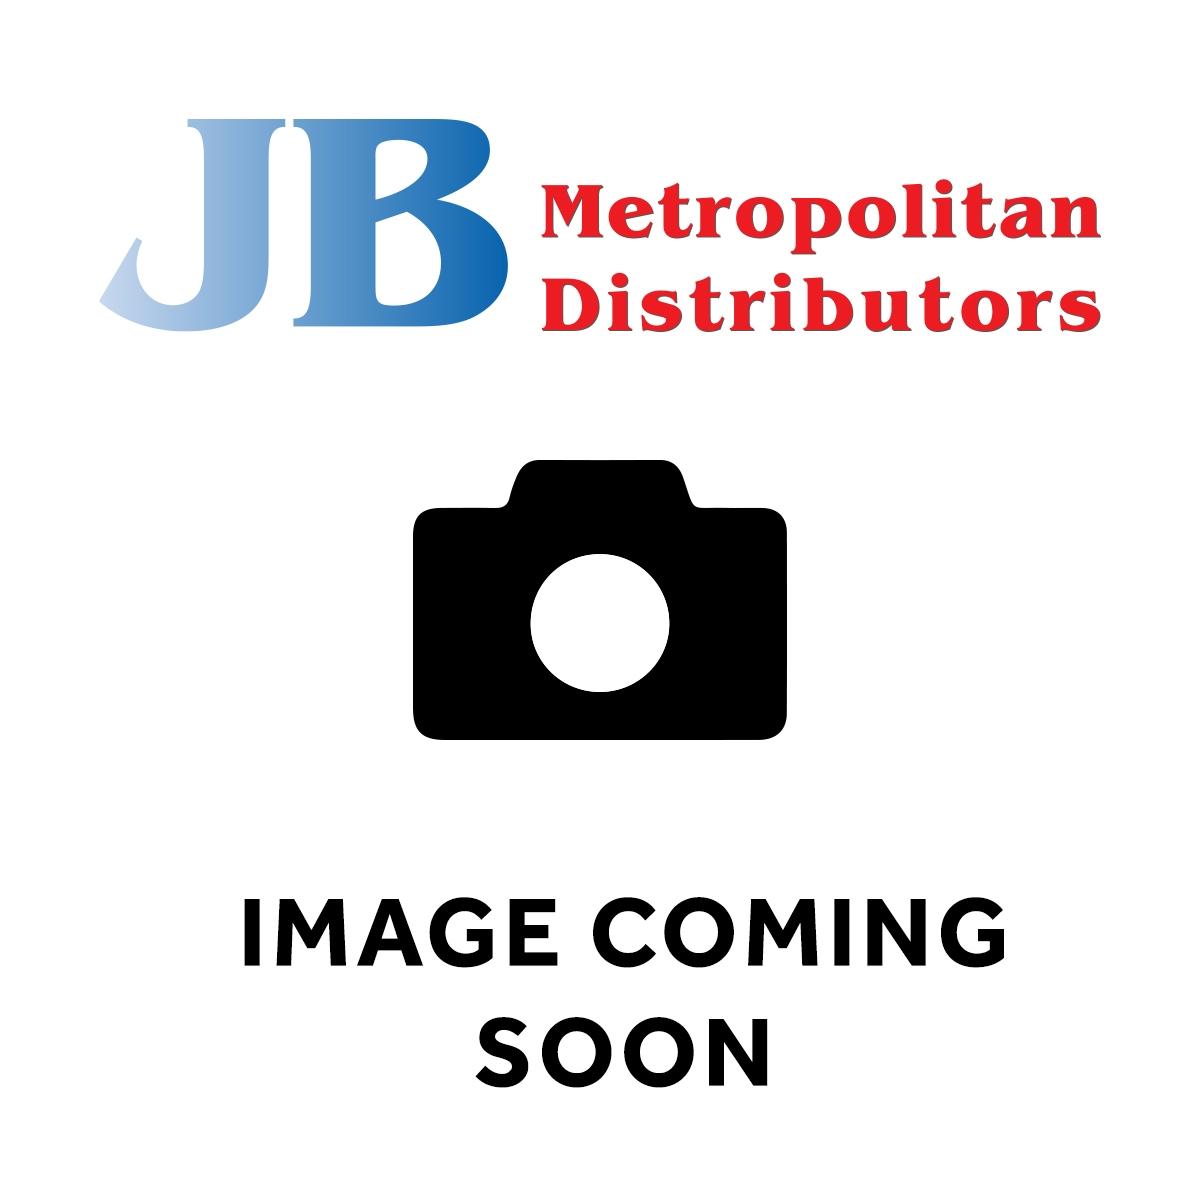 CTC BAGS BUTTER MENTHOL DROPS 25G (60)